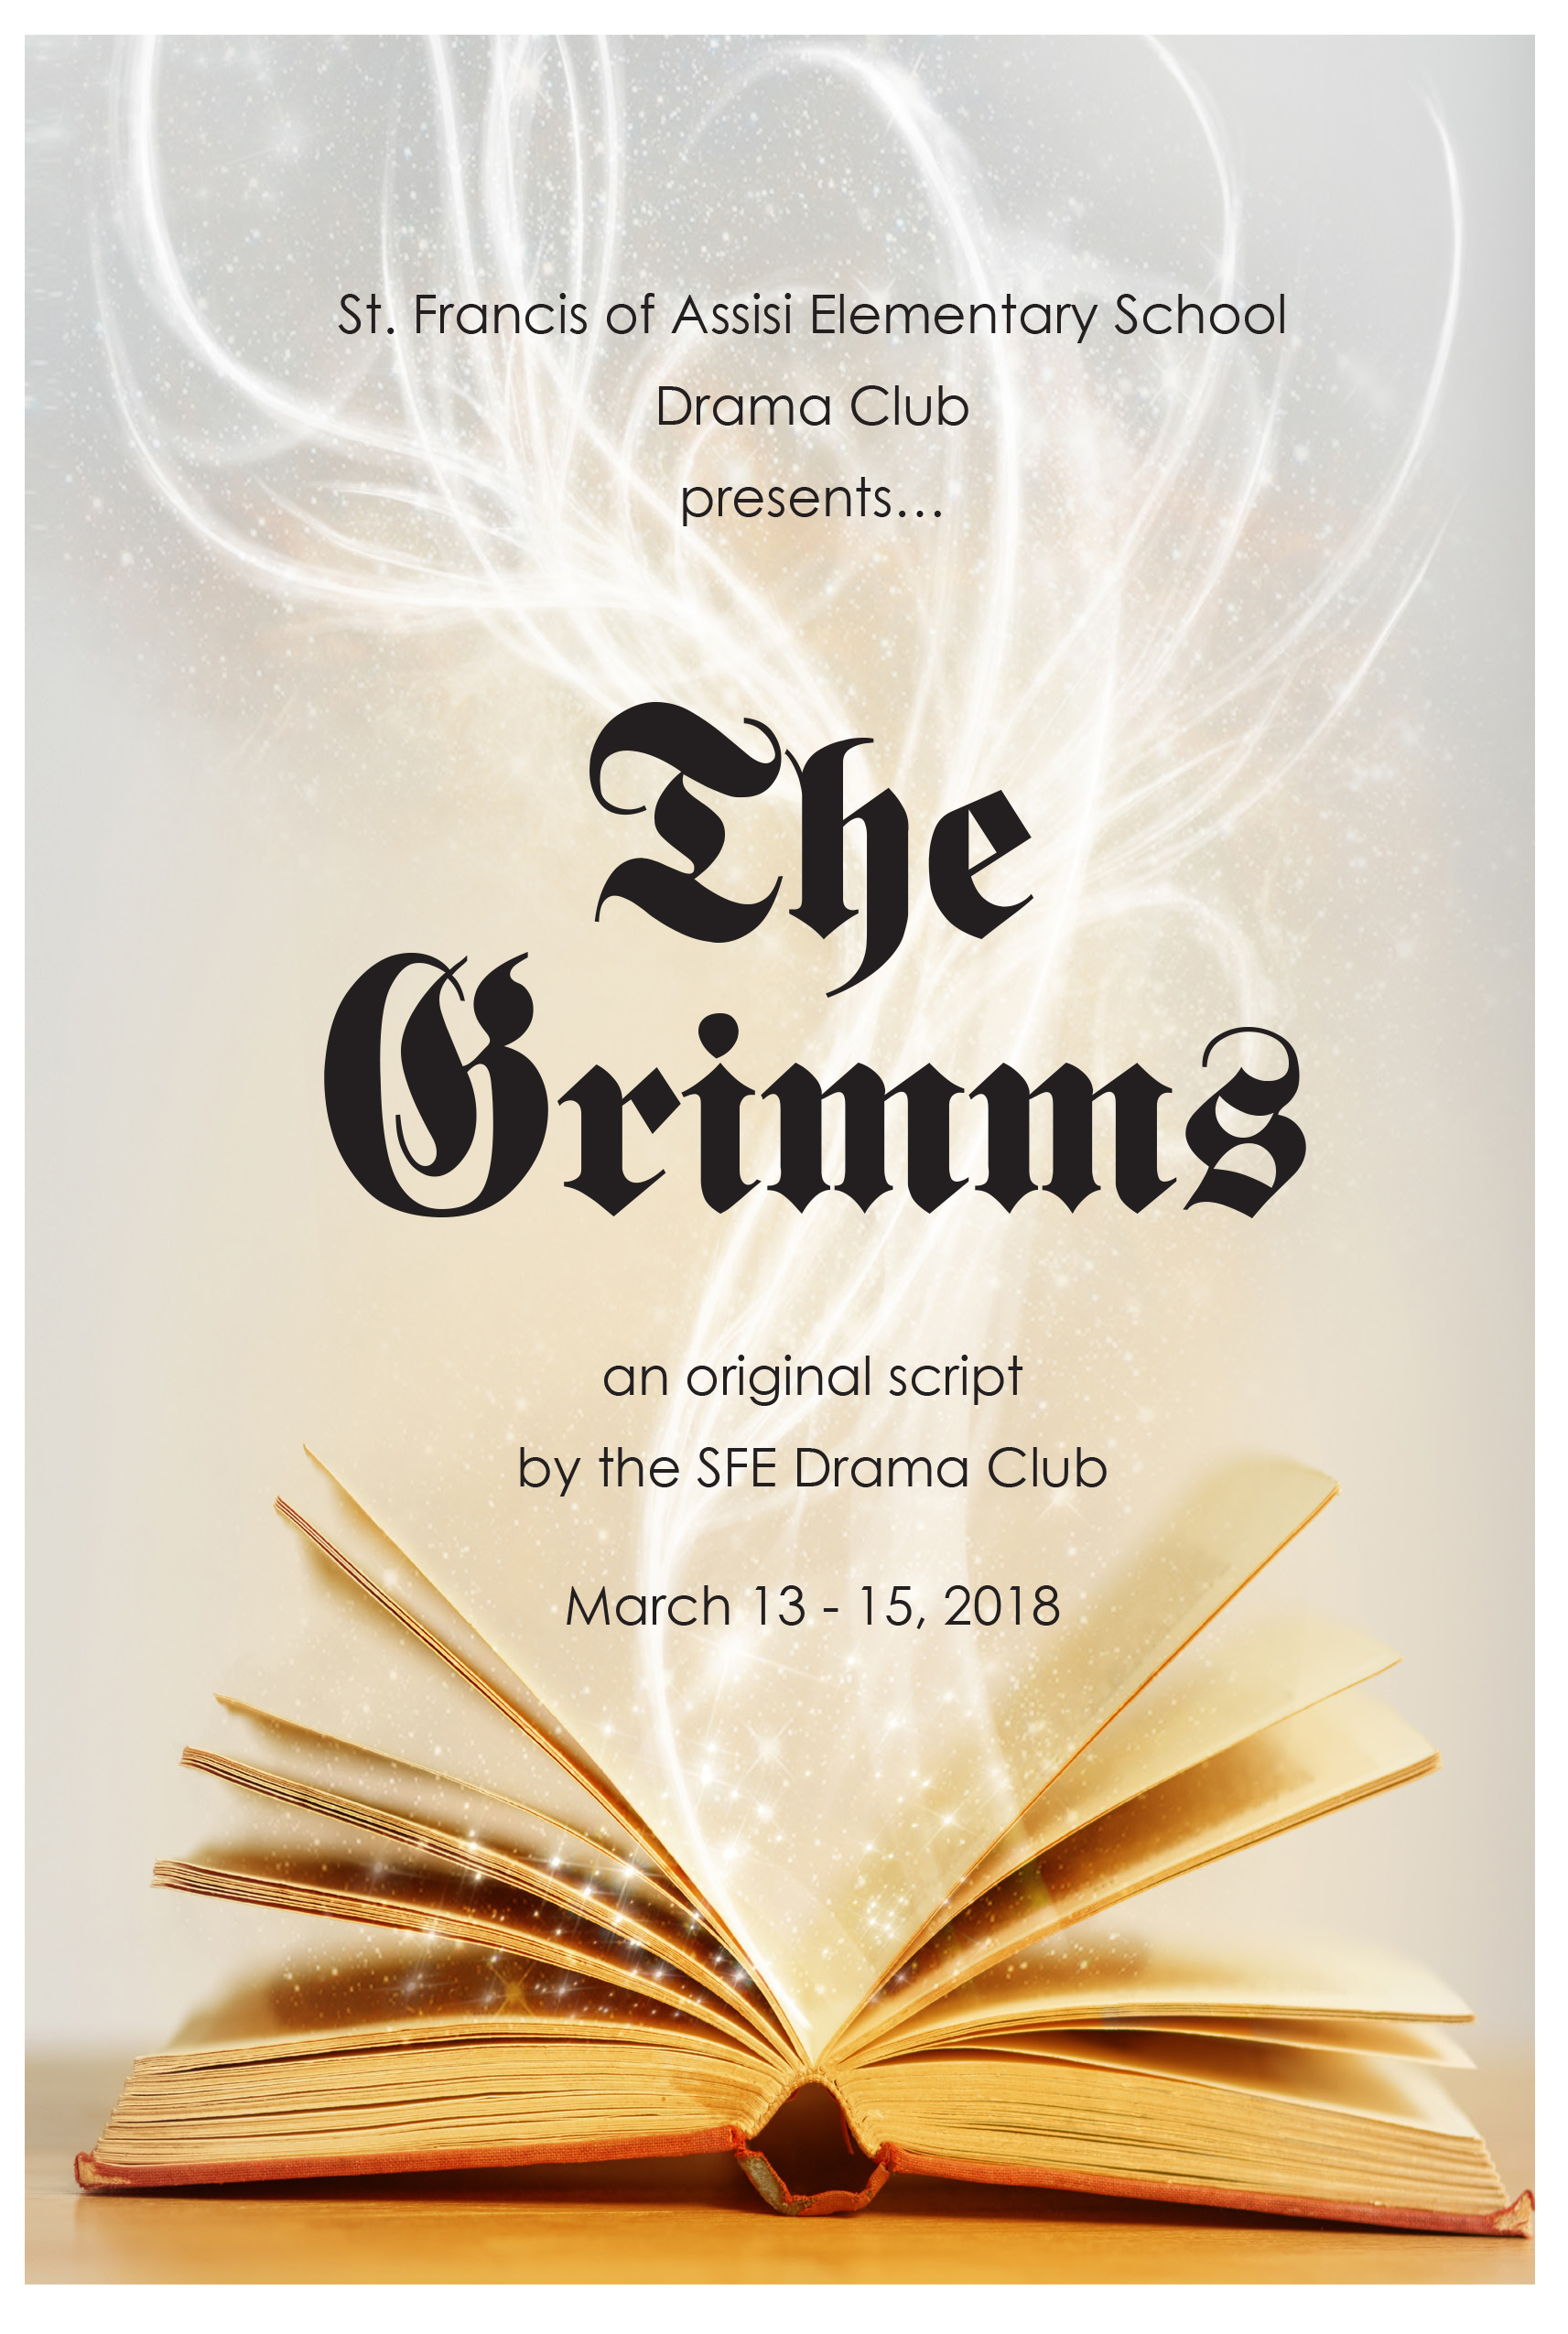 School Drama Club Poster for Print & Online Communication